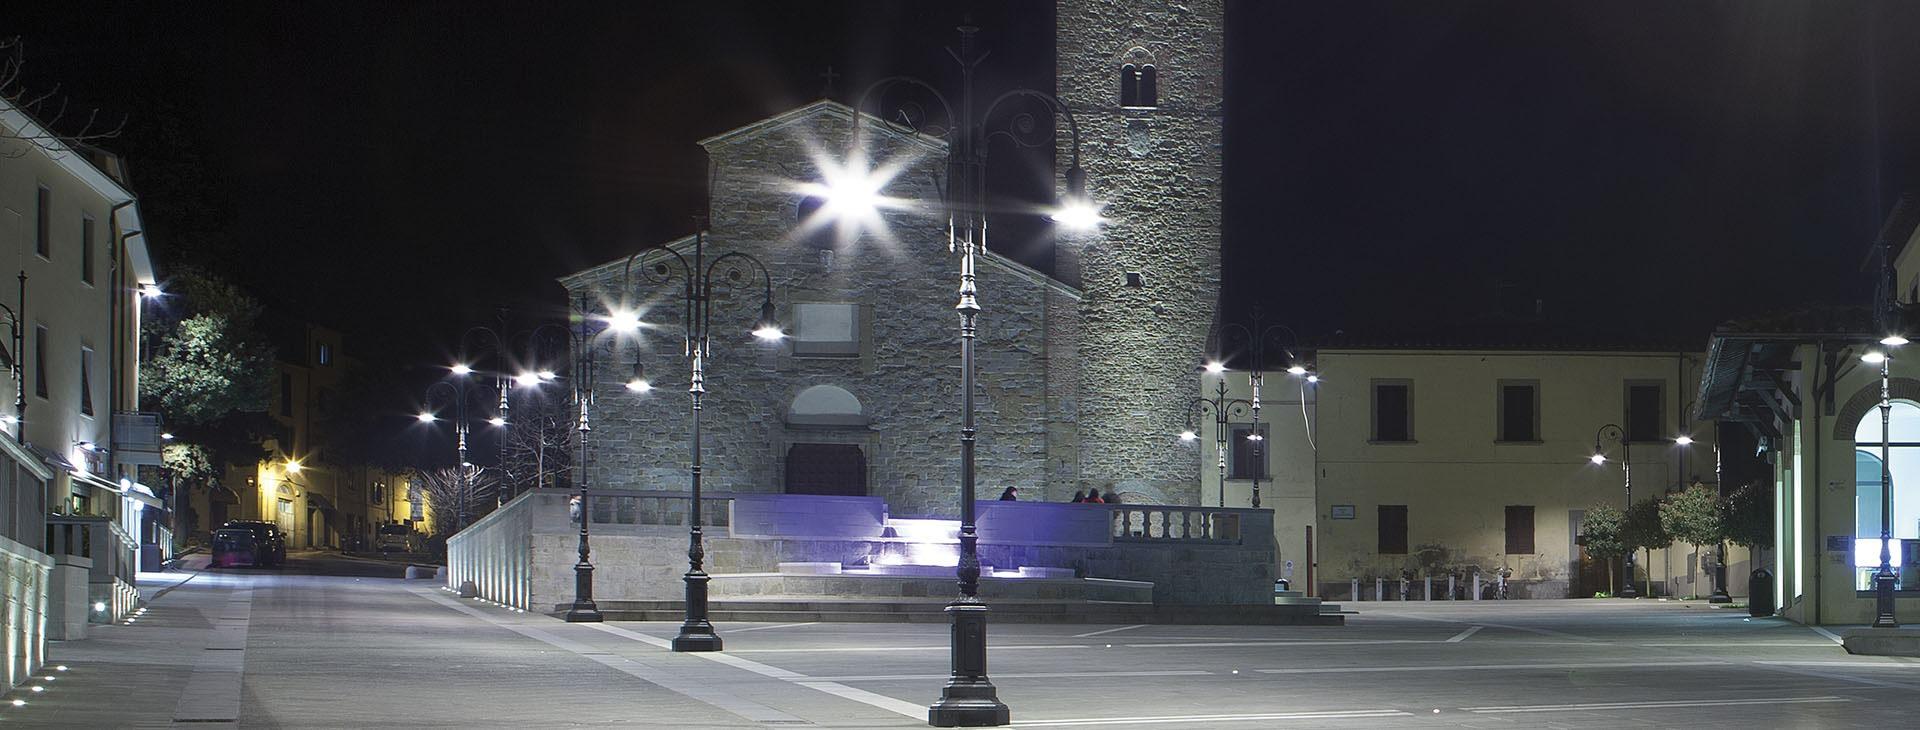 Stadscentra